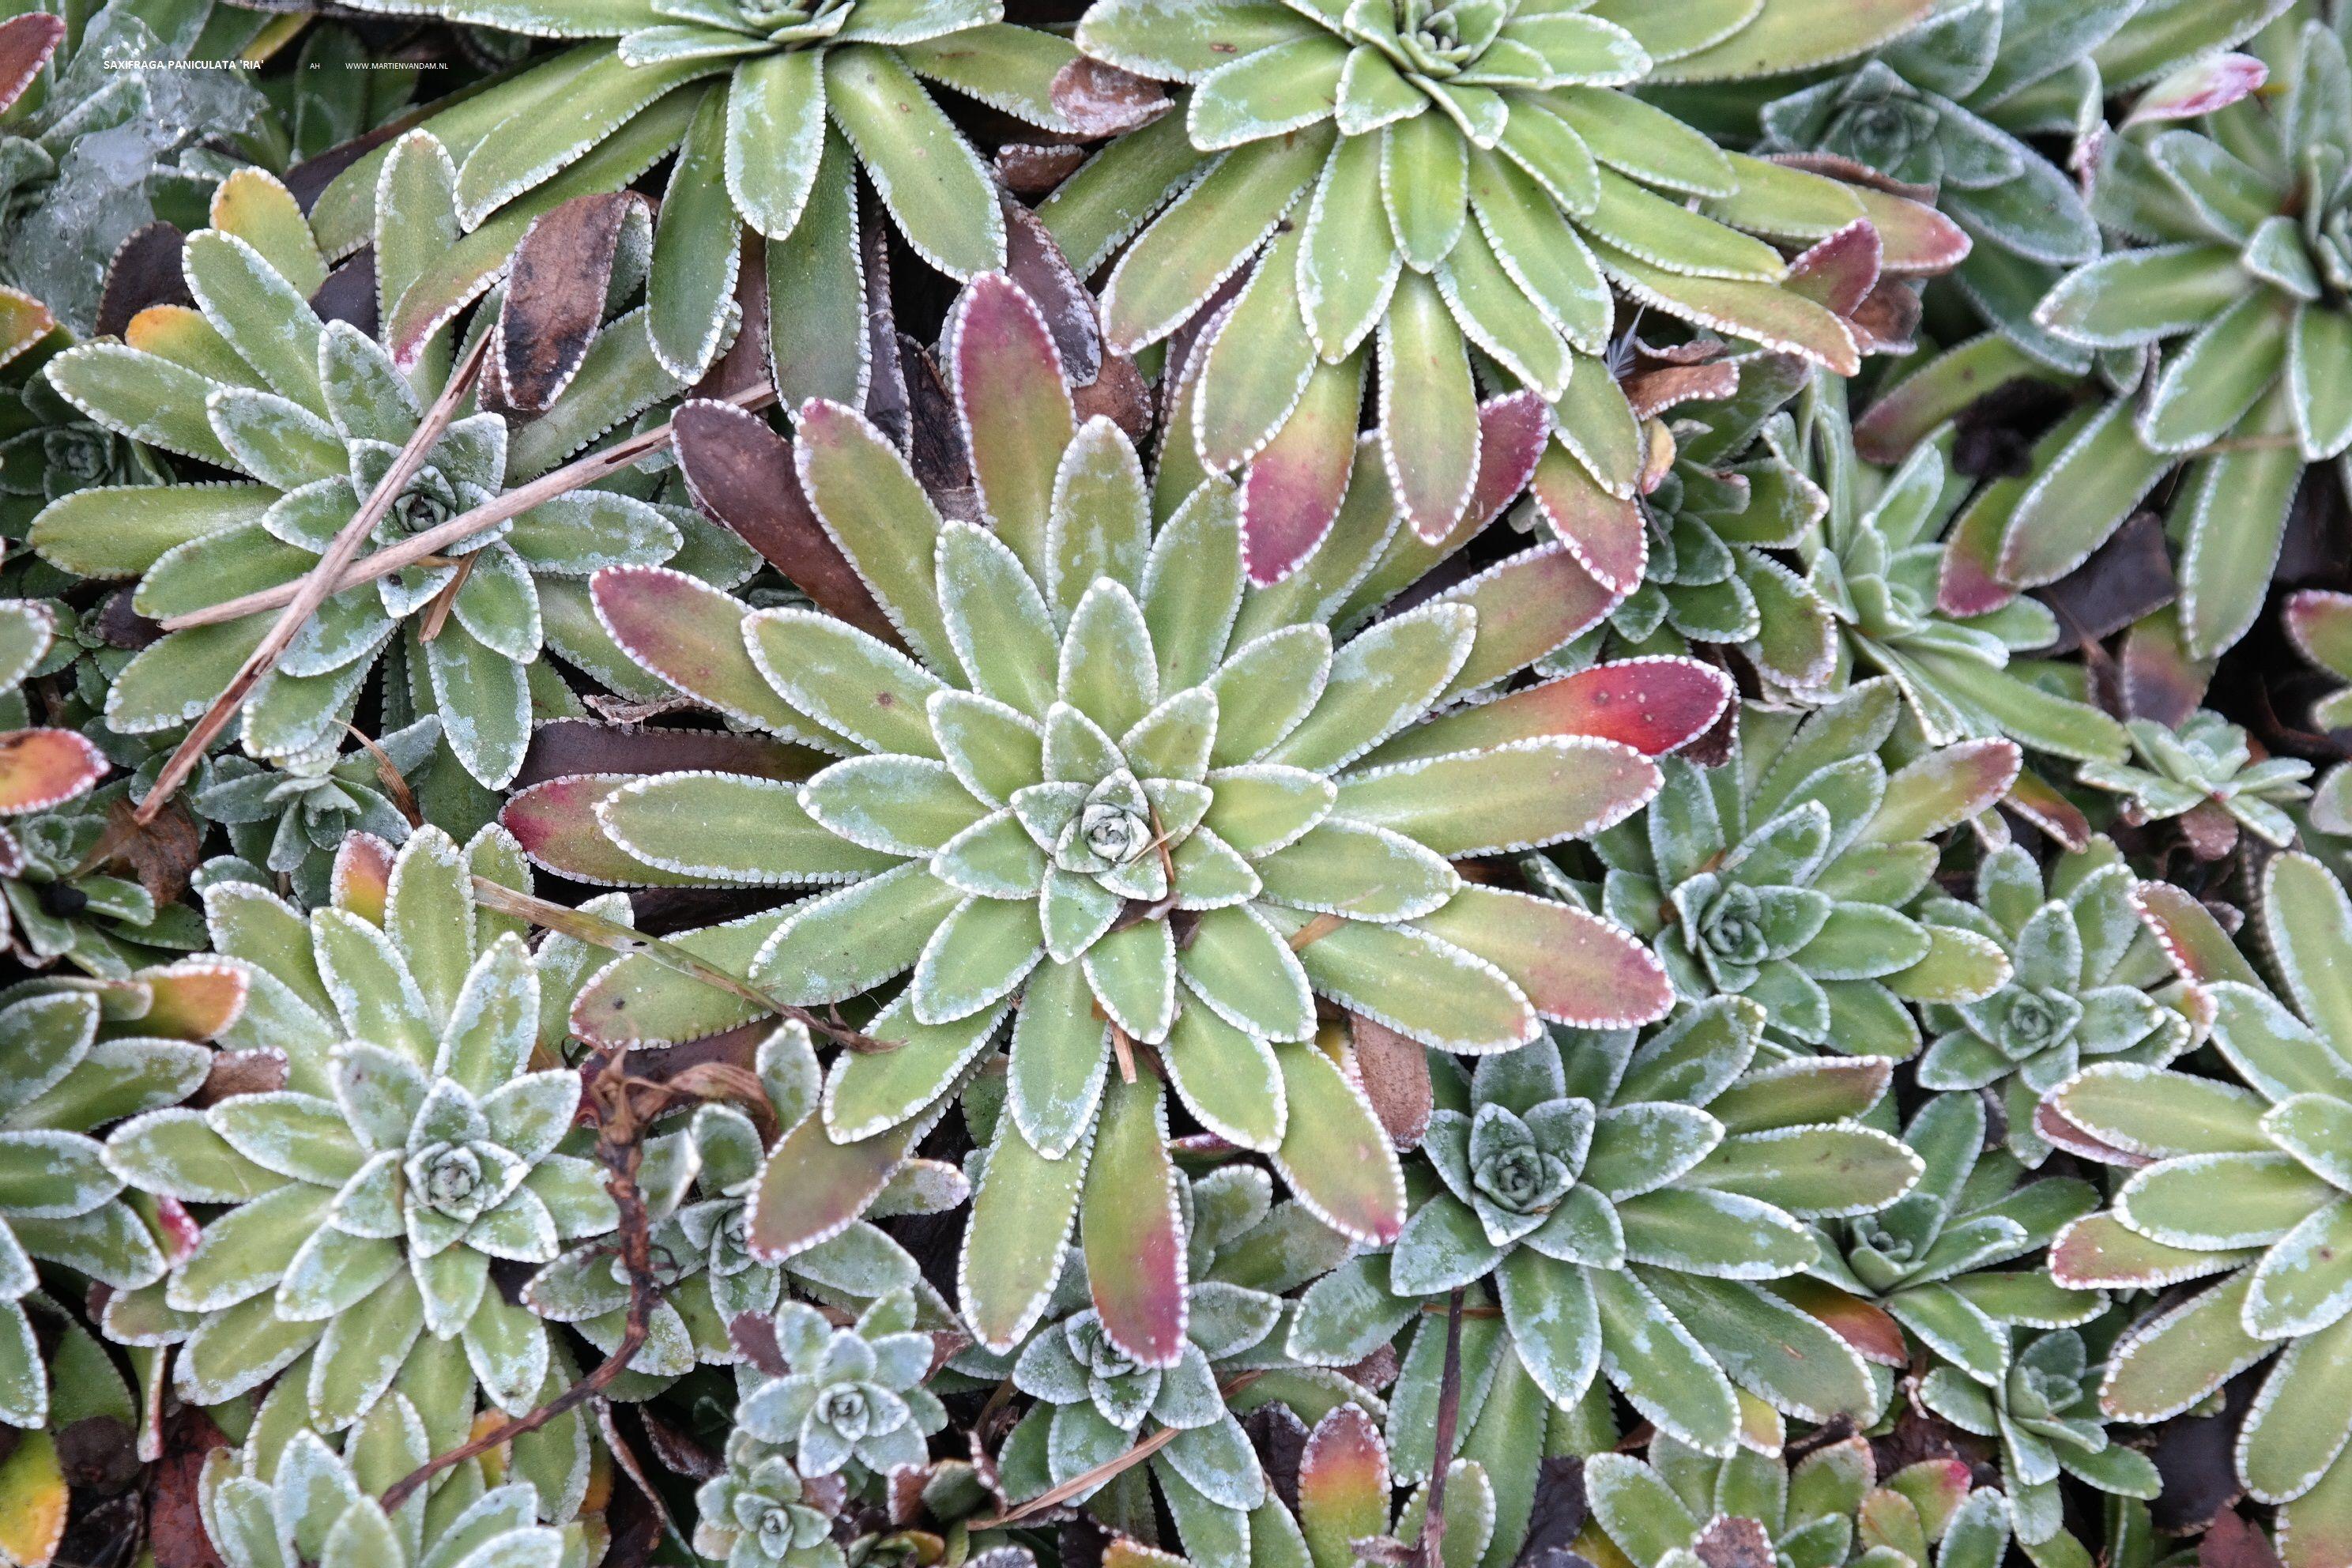 Saxifraga paniculata 'Ria': steenbreek, bloeit wit – in bloei .30 hoog, bodembedekkend (9 planten per m2)